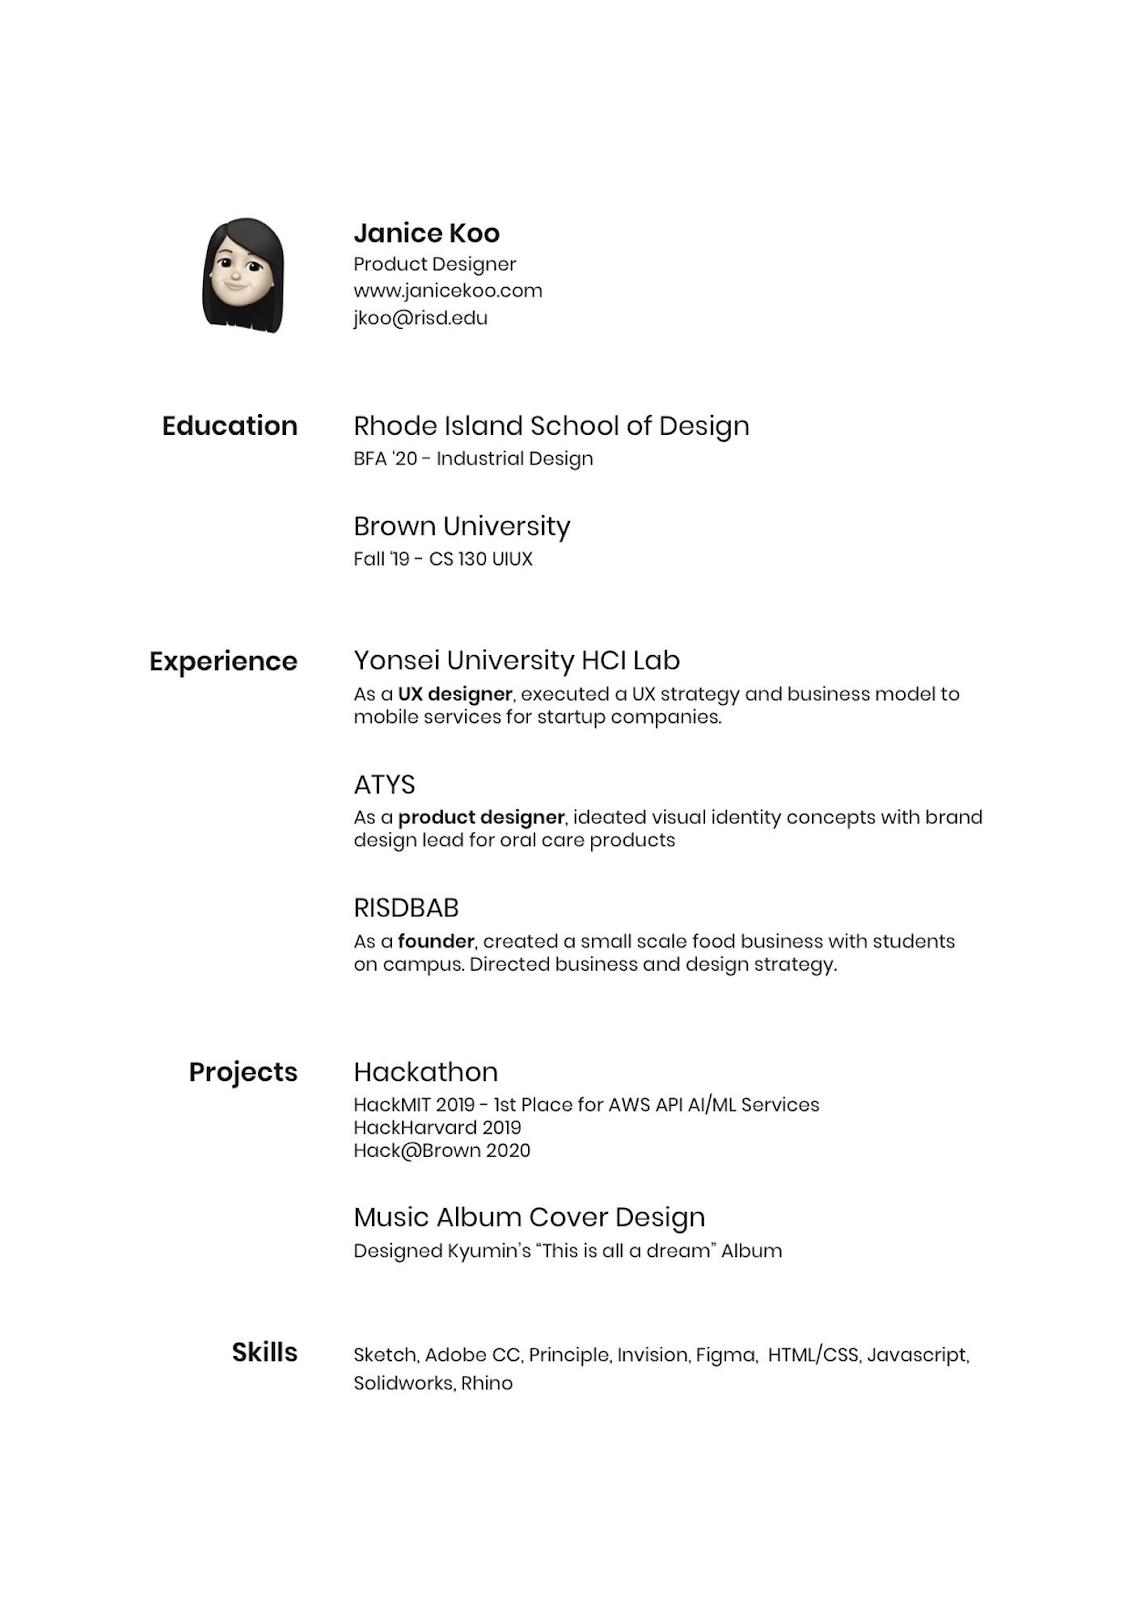 minimalist CV design